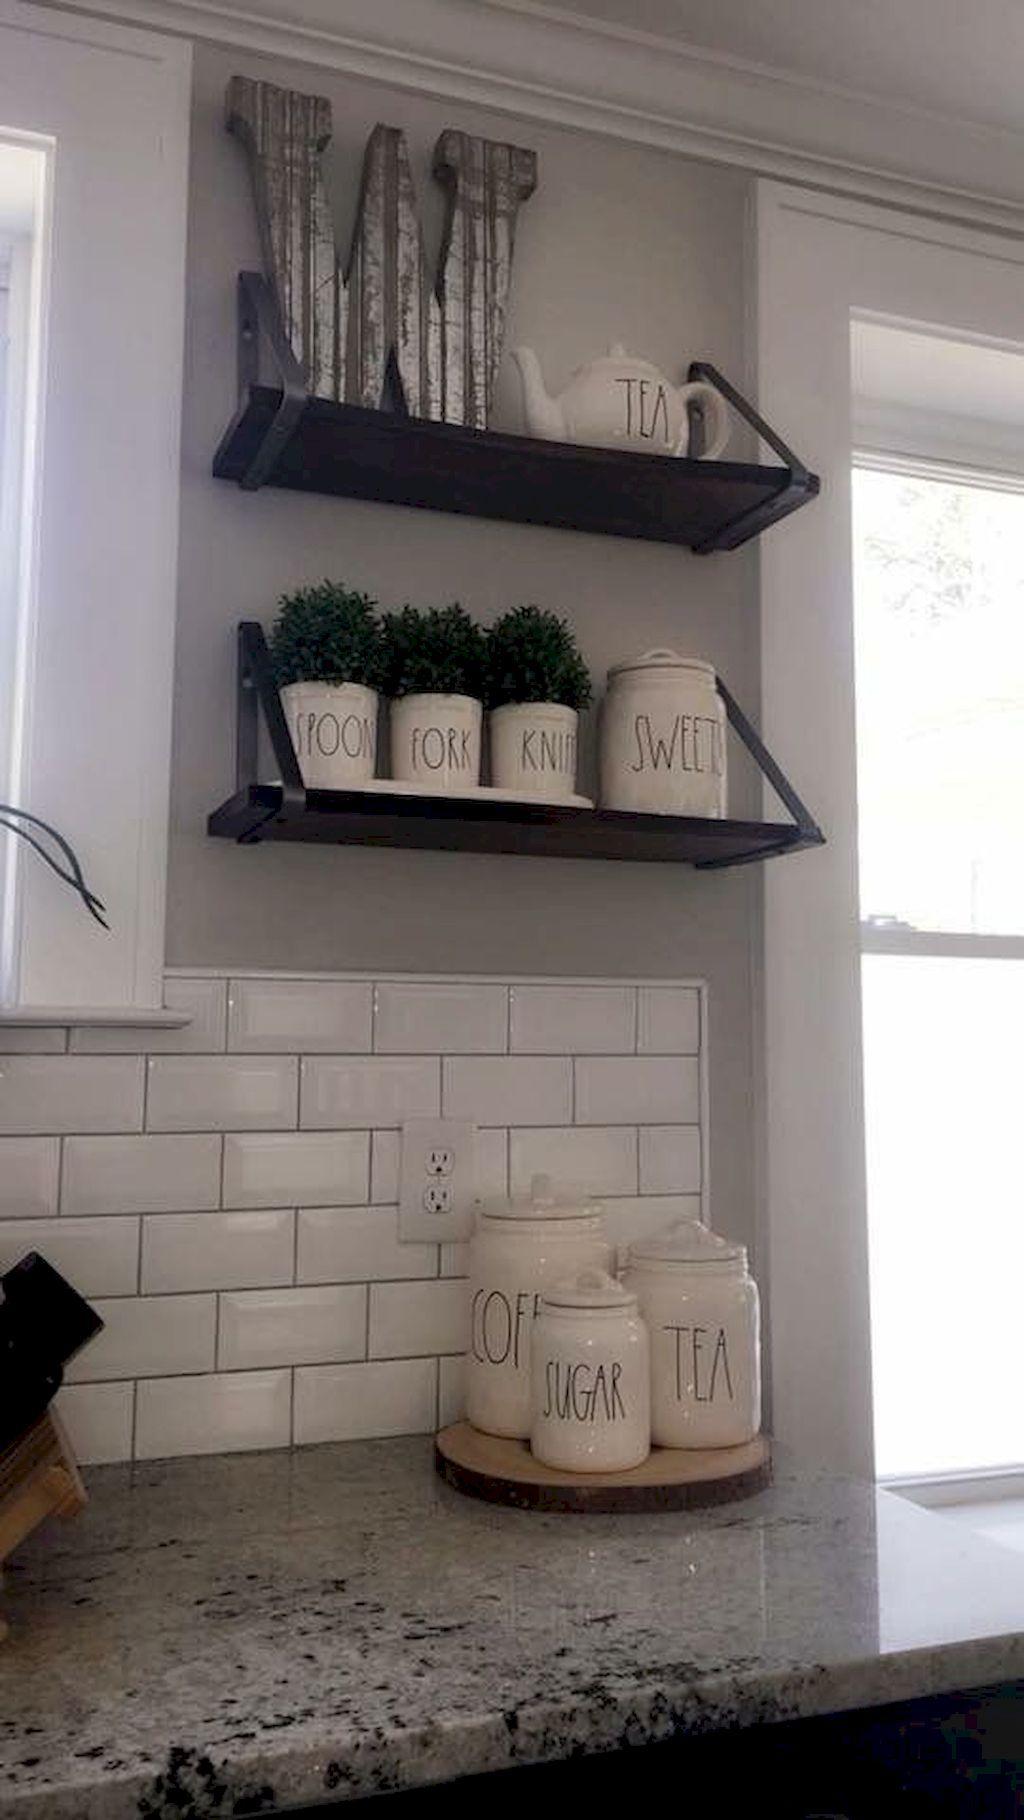 farmhouse open shelves kitchen decor ideas domakeover also house decorations rh pinterest